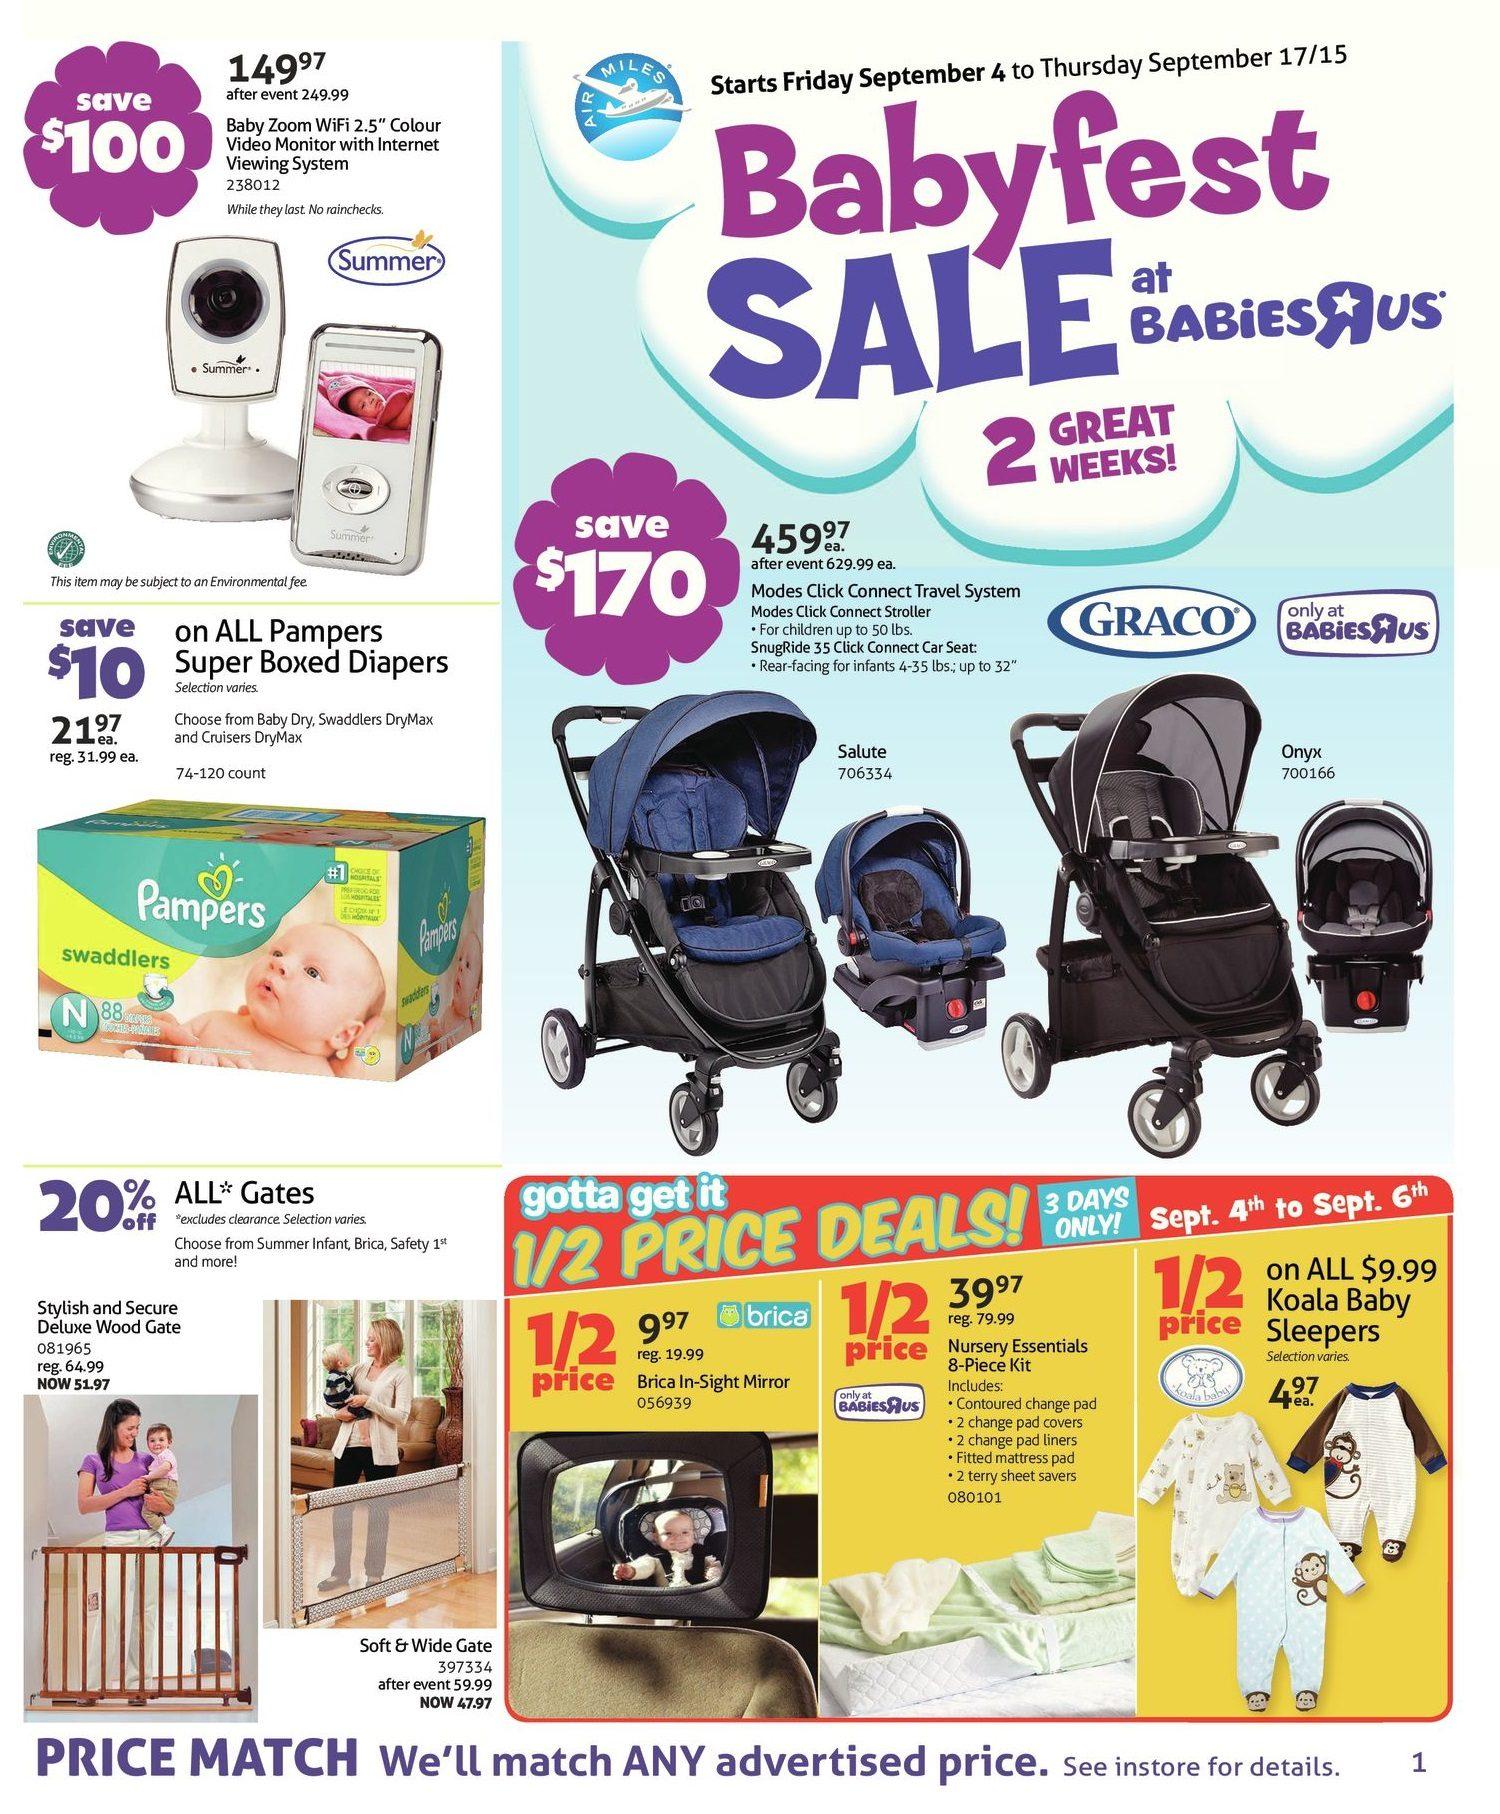 Babies R Us Weekly Flyer 2 Week Sale Babyfest Sep 4 17 Buy Get 20 Chicco Baby Moments Bath Foam Soft Cup